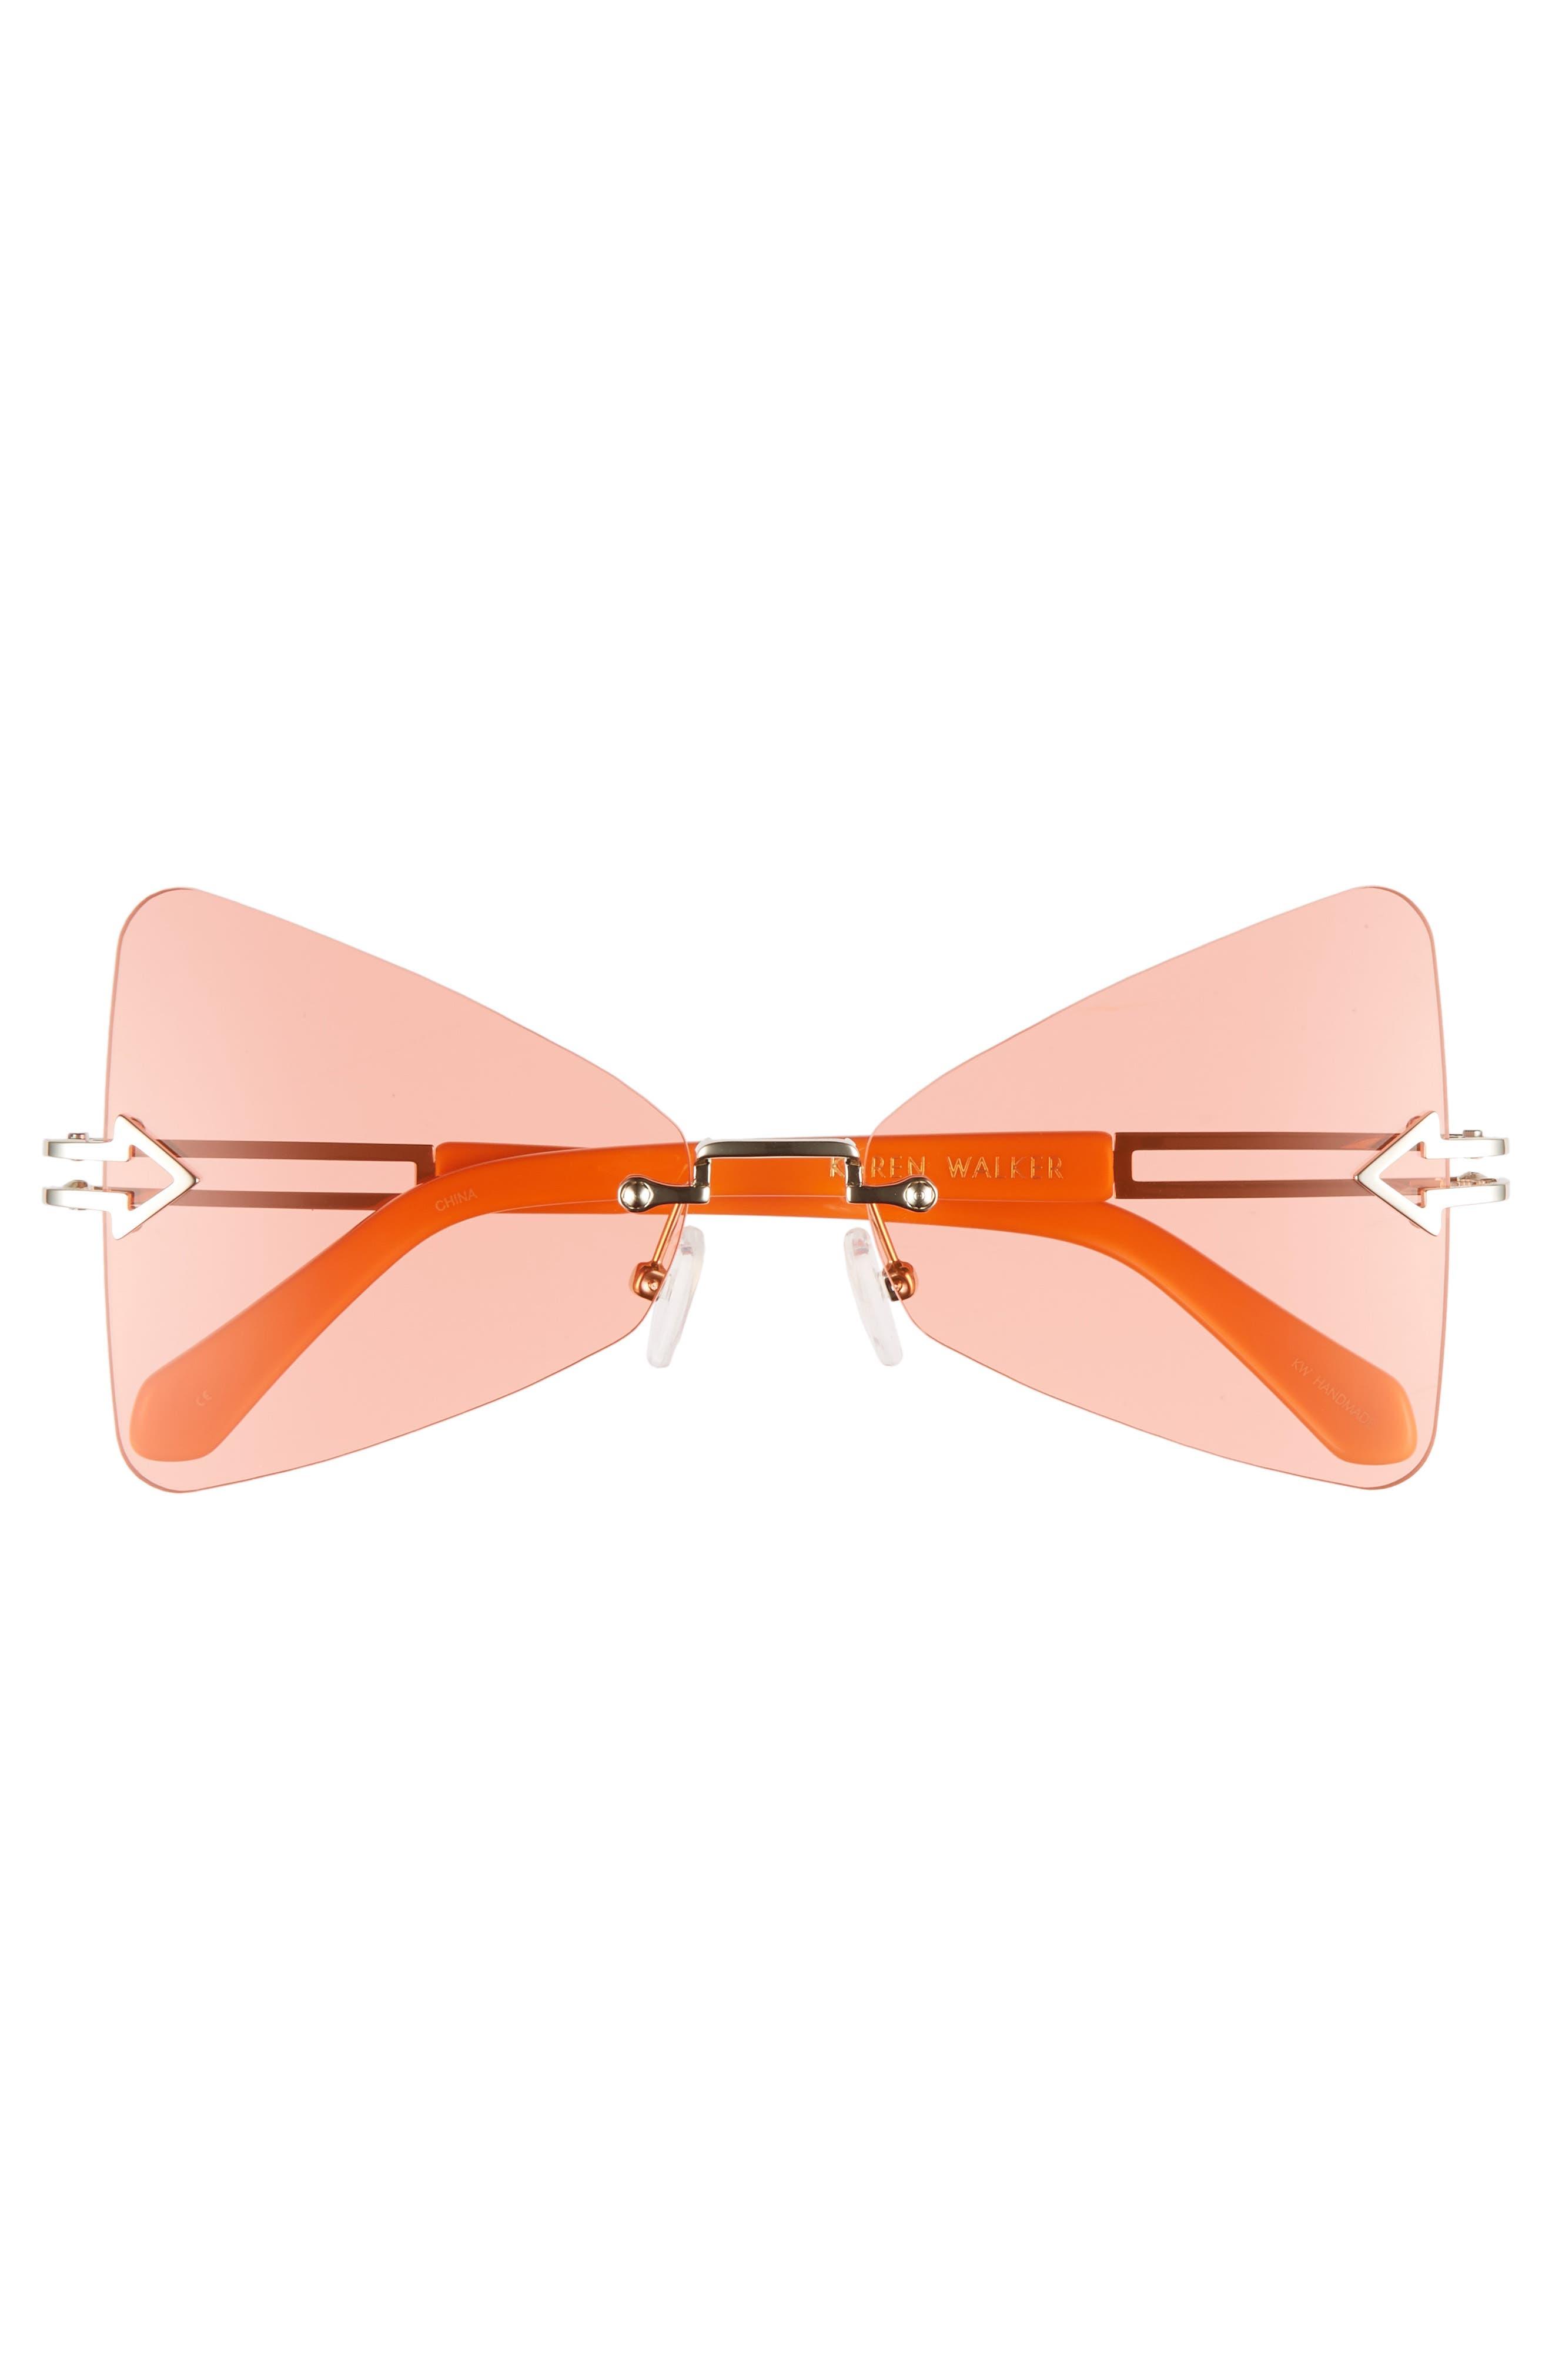 Paradise 57mm Sunglasses,                             Alternate thumbnail 3, color,                             Tangerine/ Coral